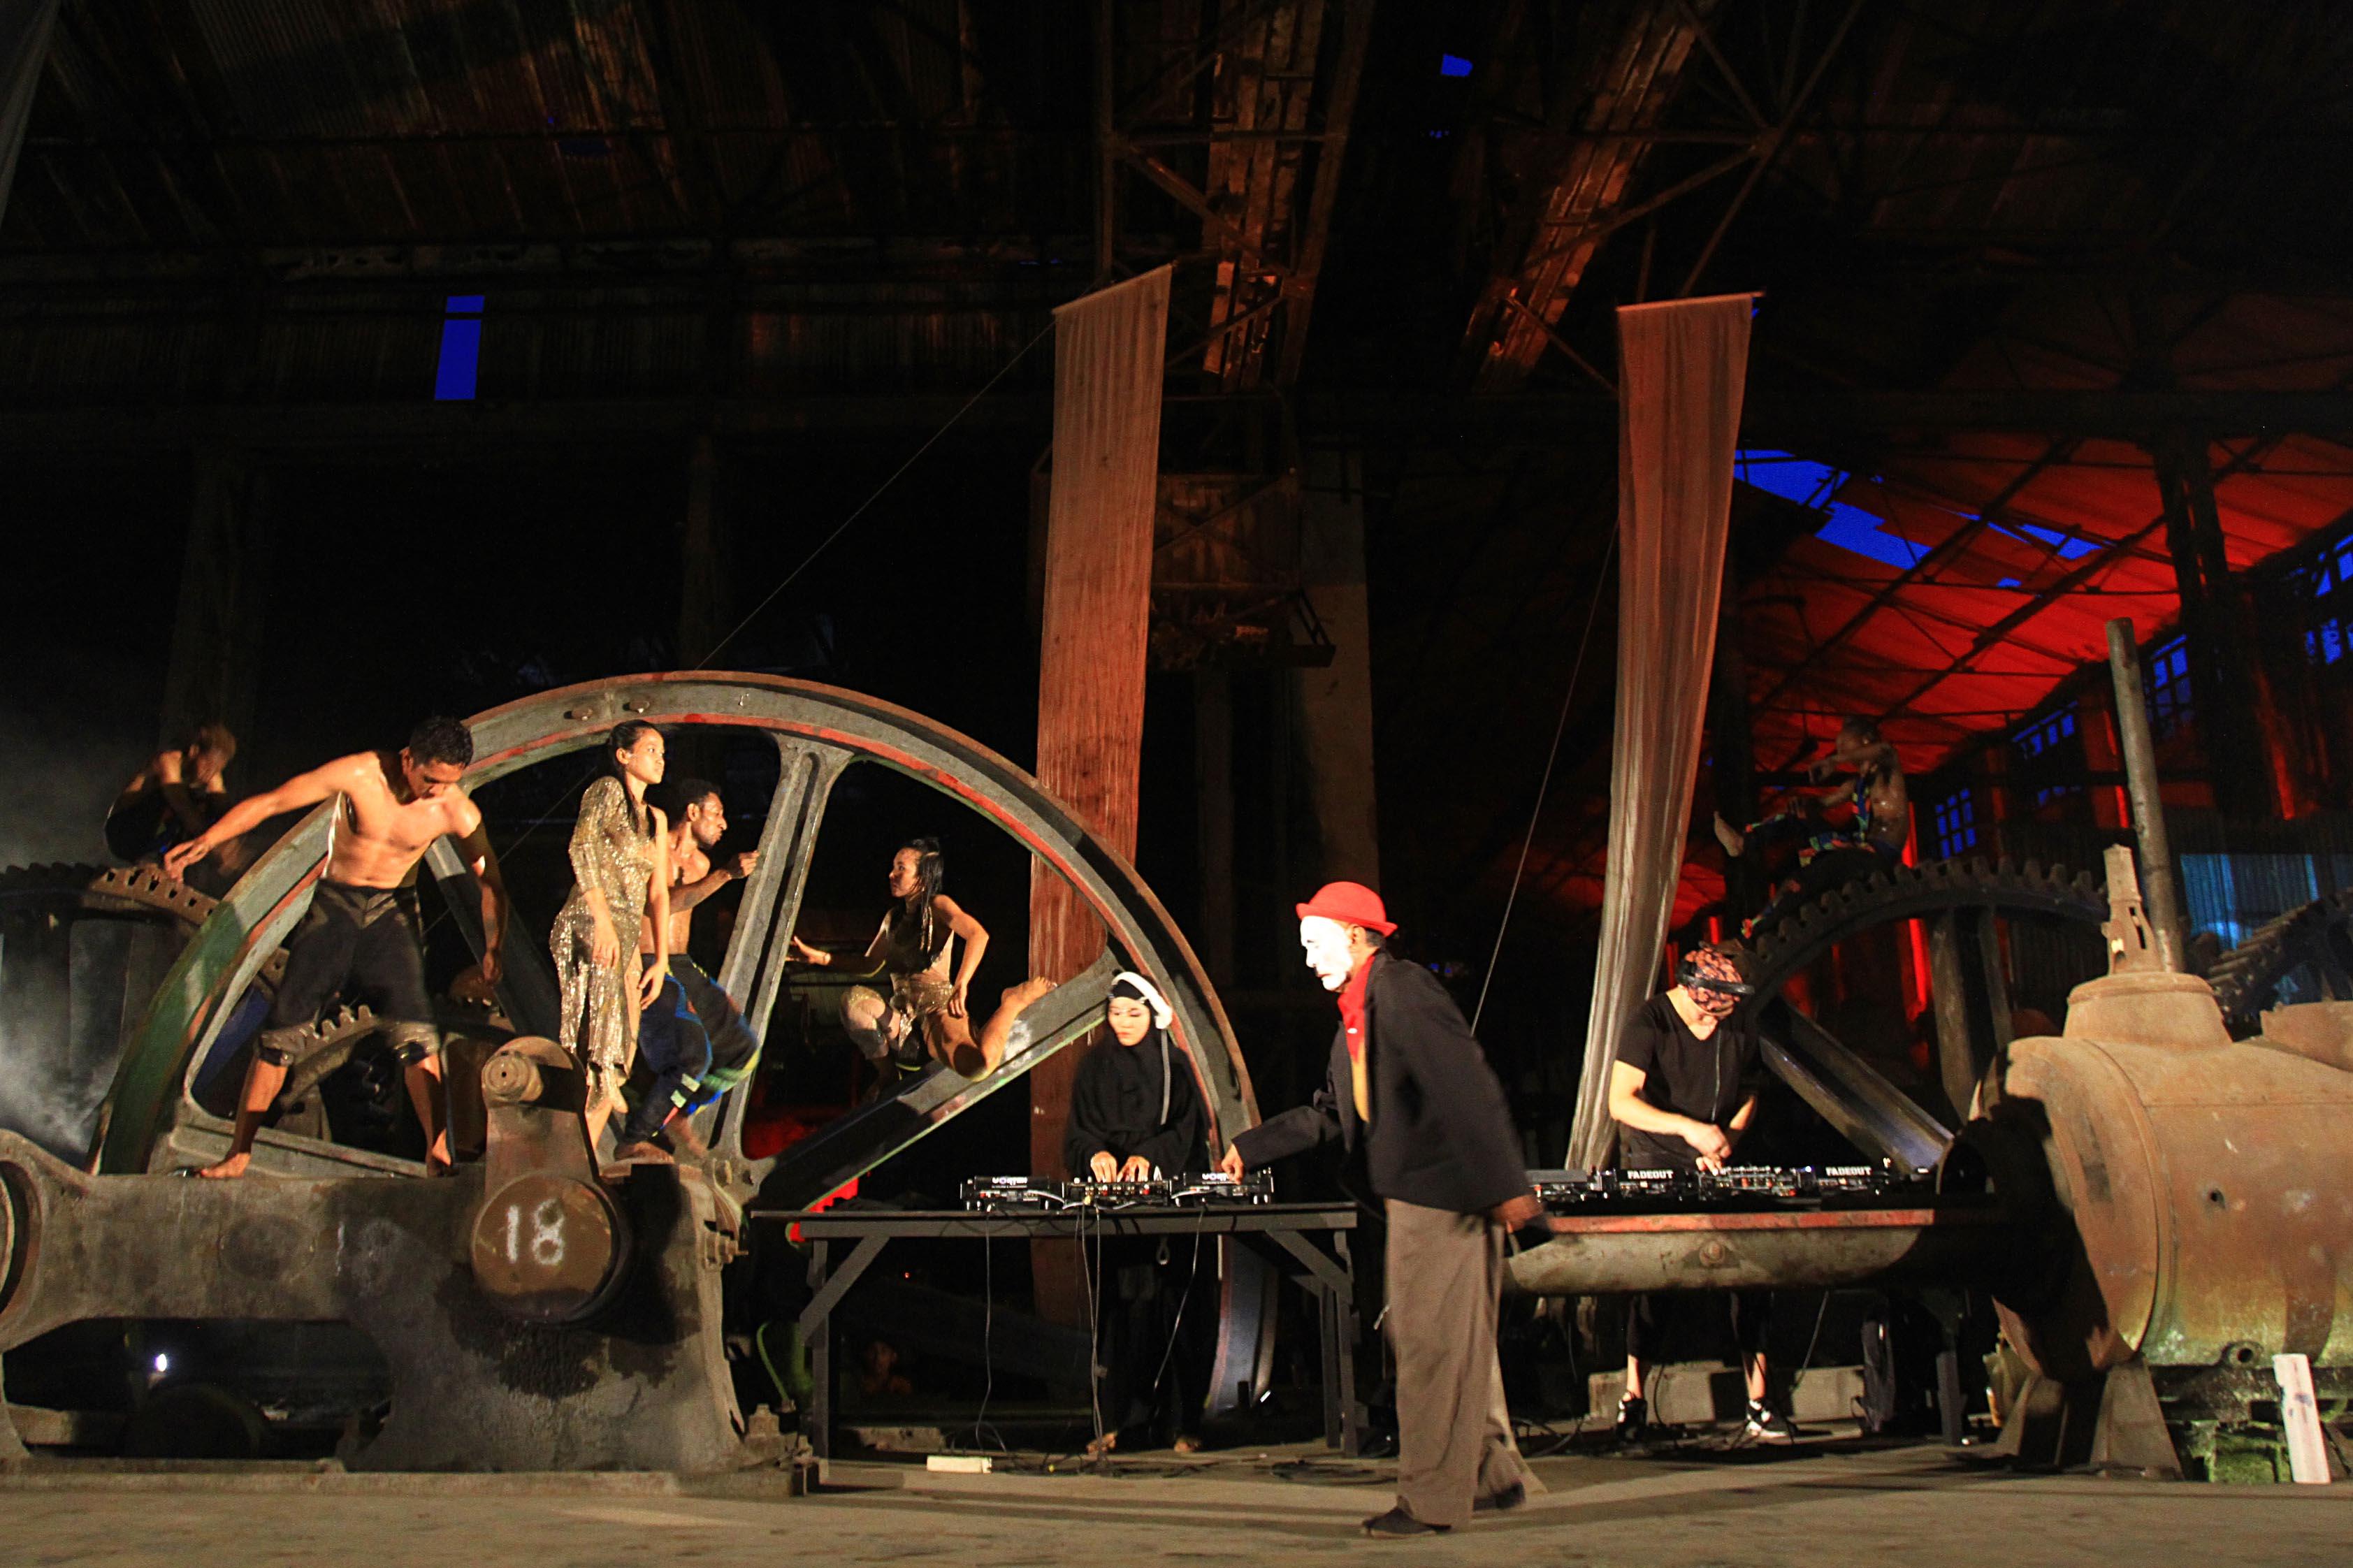 Joglosemar | Kurniawan Arie Wibowo FABRIEK FIKR 2 - Penari membawakan seni performing art saat tampil dalam gelaran Fabriek Fikr 2 di bekas bangunan pabrik gula Colomadu, Karanganyar, Sabtu (19/11).